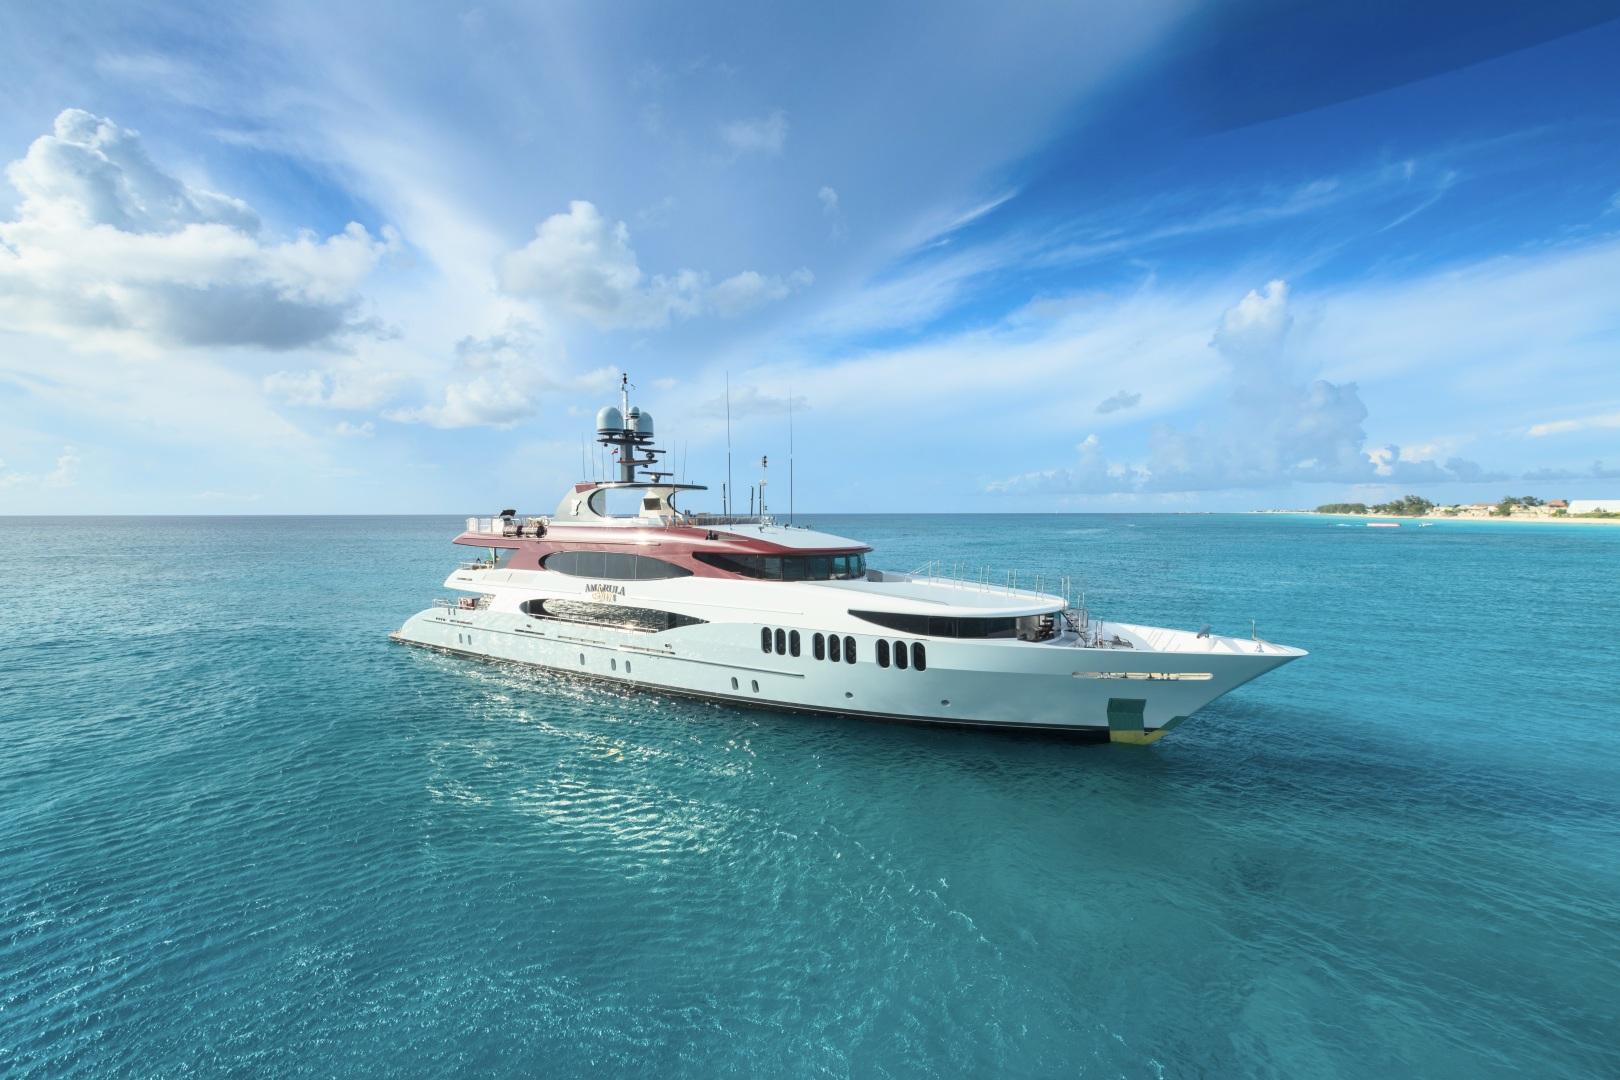 Trinity Yachts-164 Tri-deck Motor Yacht 2008-Amarula Sun Fort Lauderdale-Florida-United States-Starboard Profile-1513954 | Thumbnail